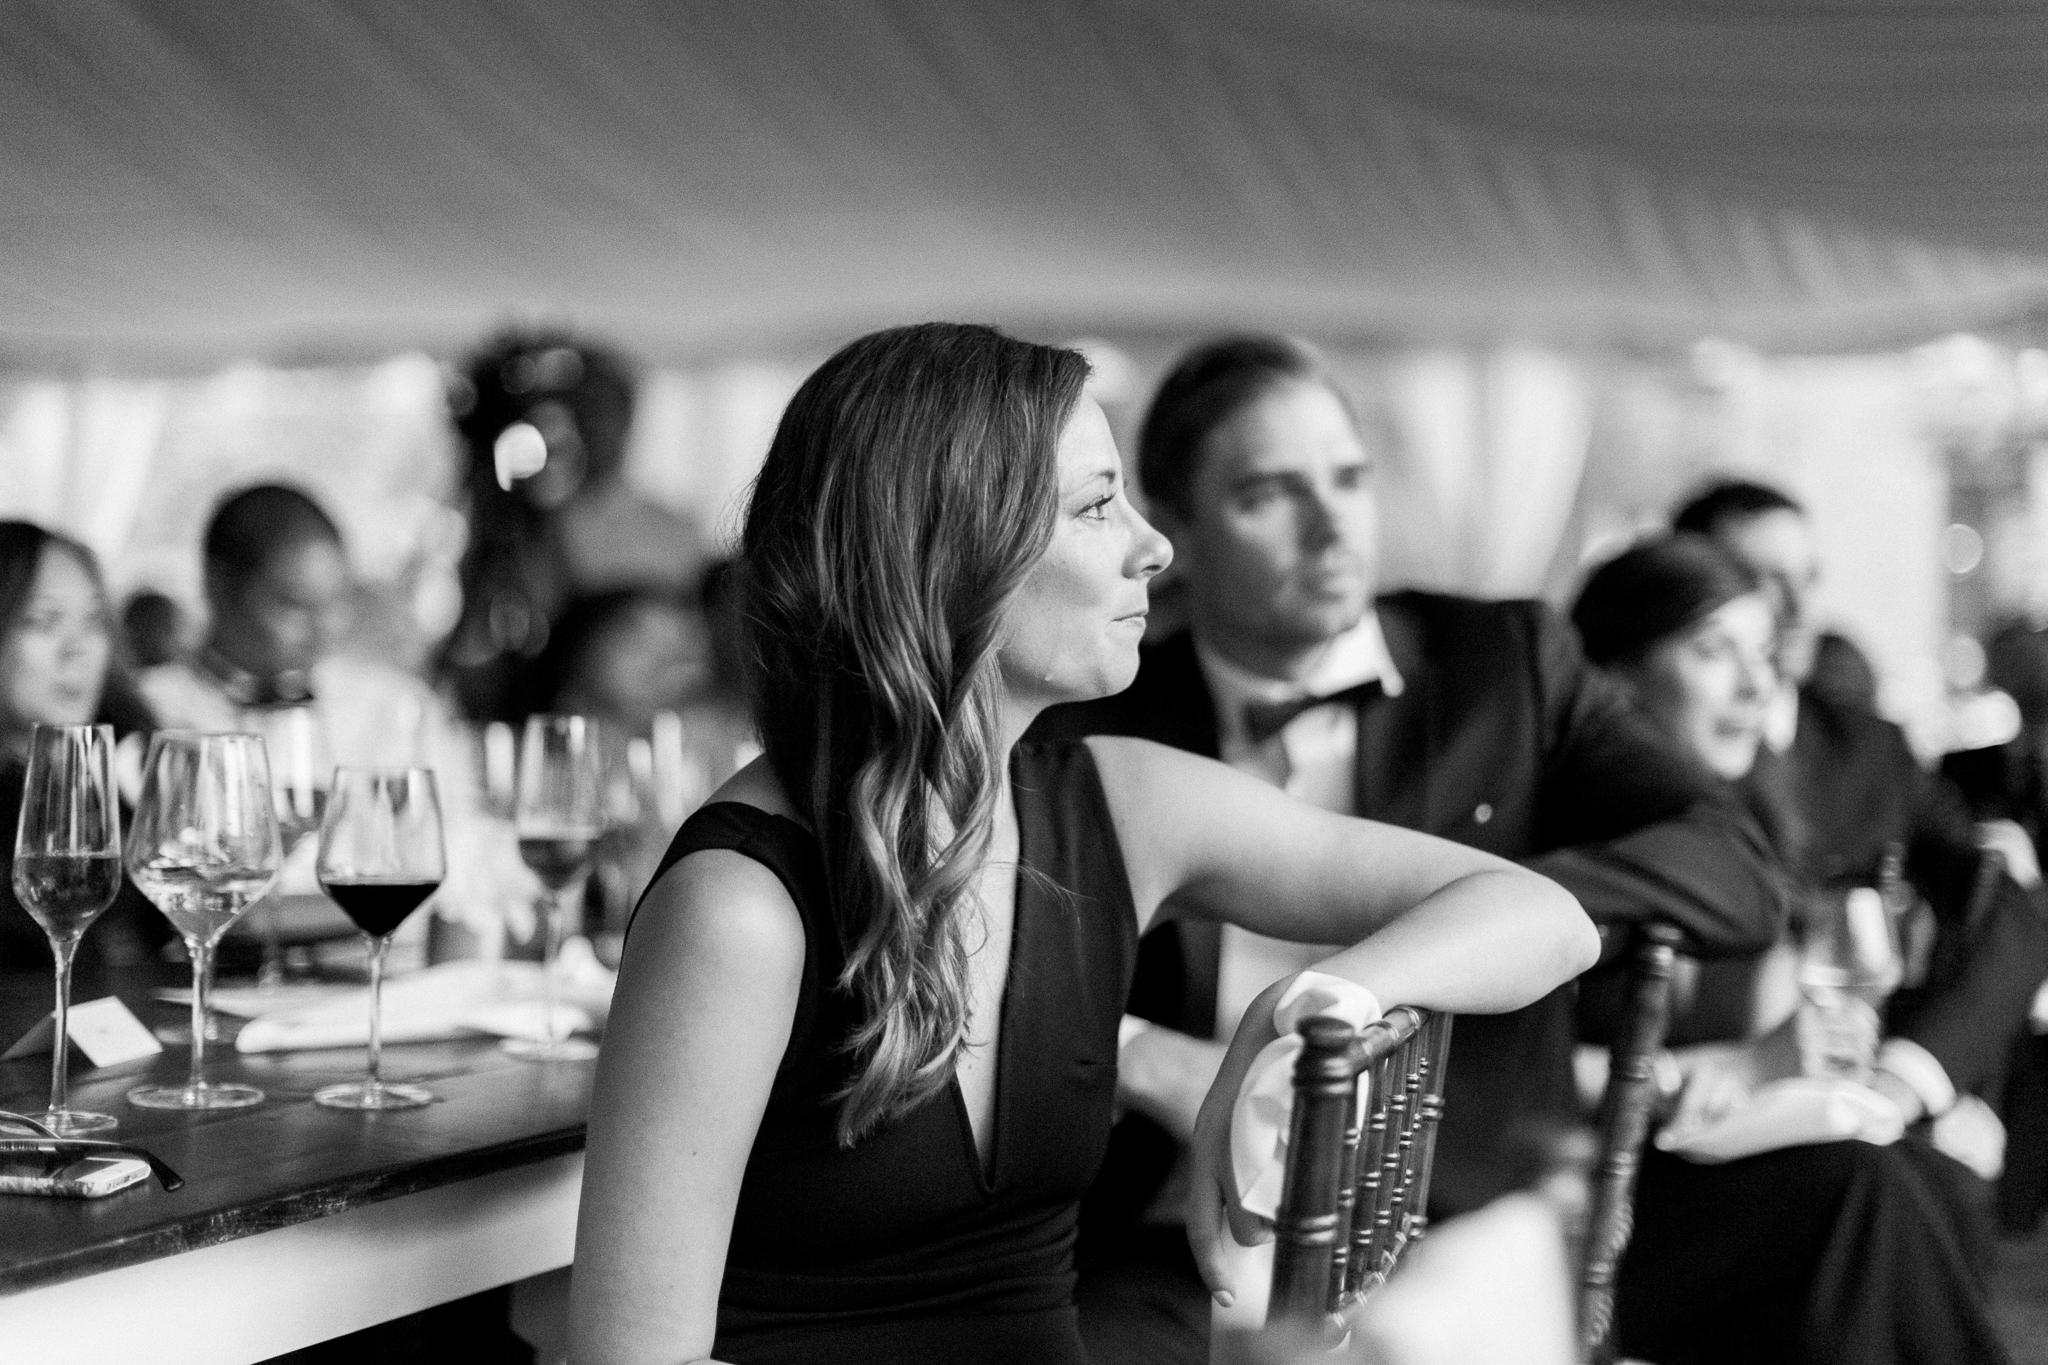 200OutliveCreative_Travel_Photographer_Videographer_Lewis&Clark_Oregon_Elegant_BlackTie_Destination_Wedding.jpg